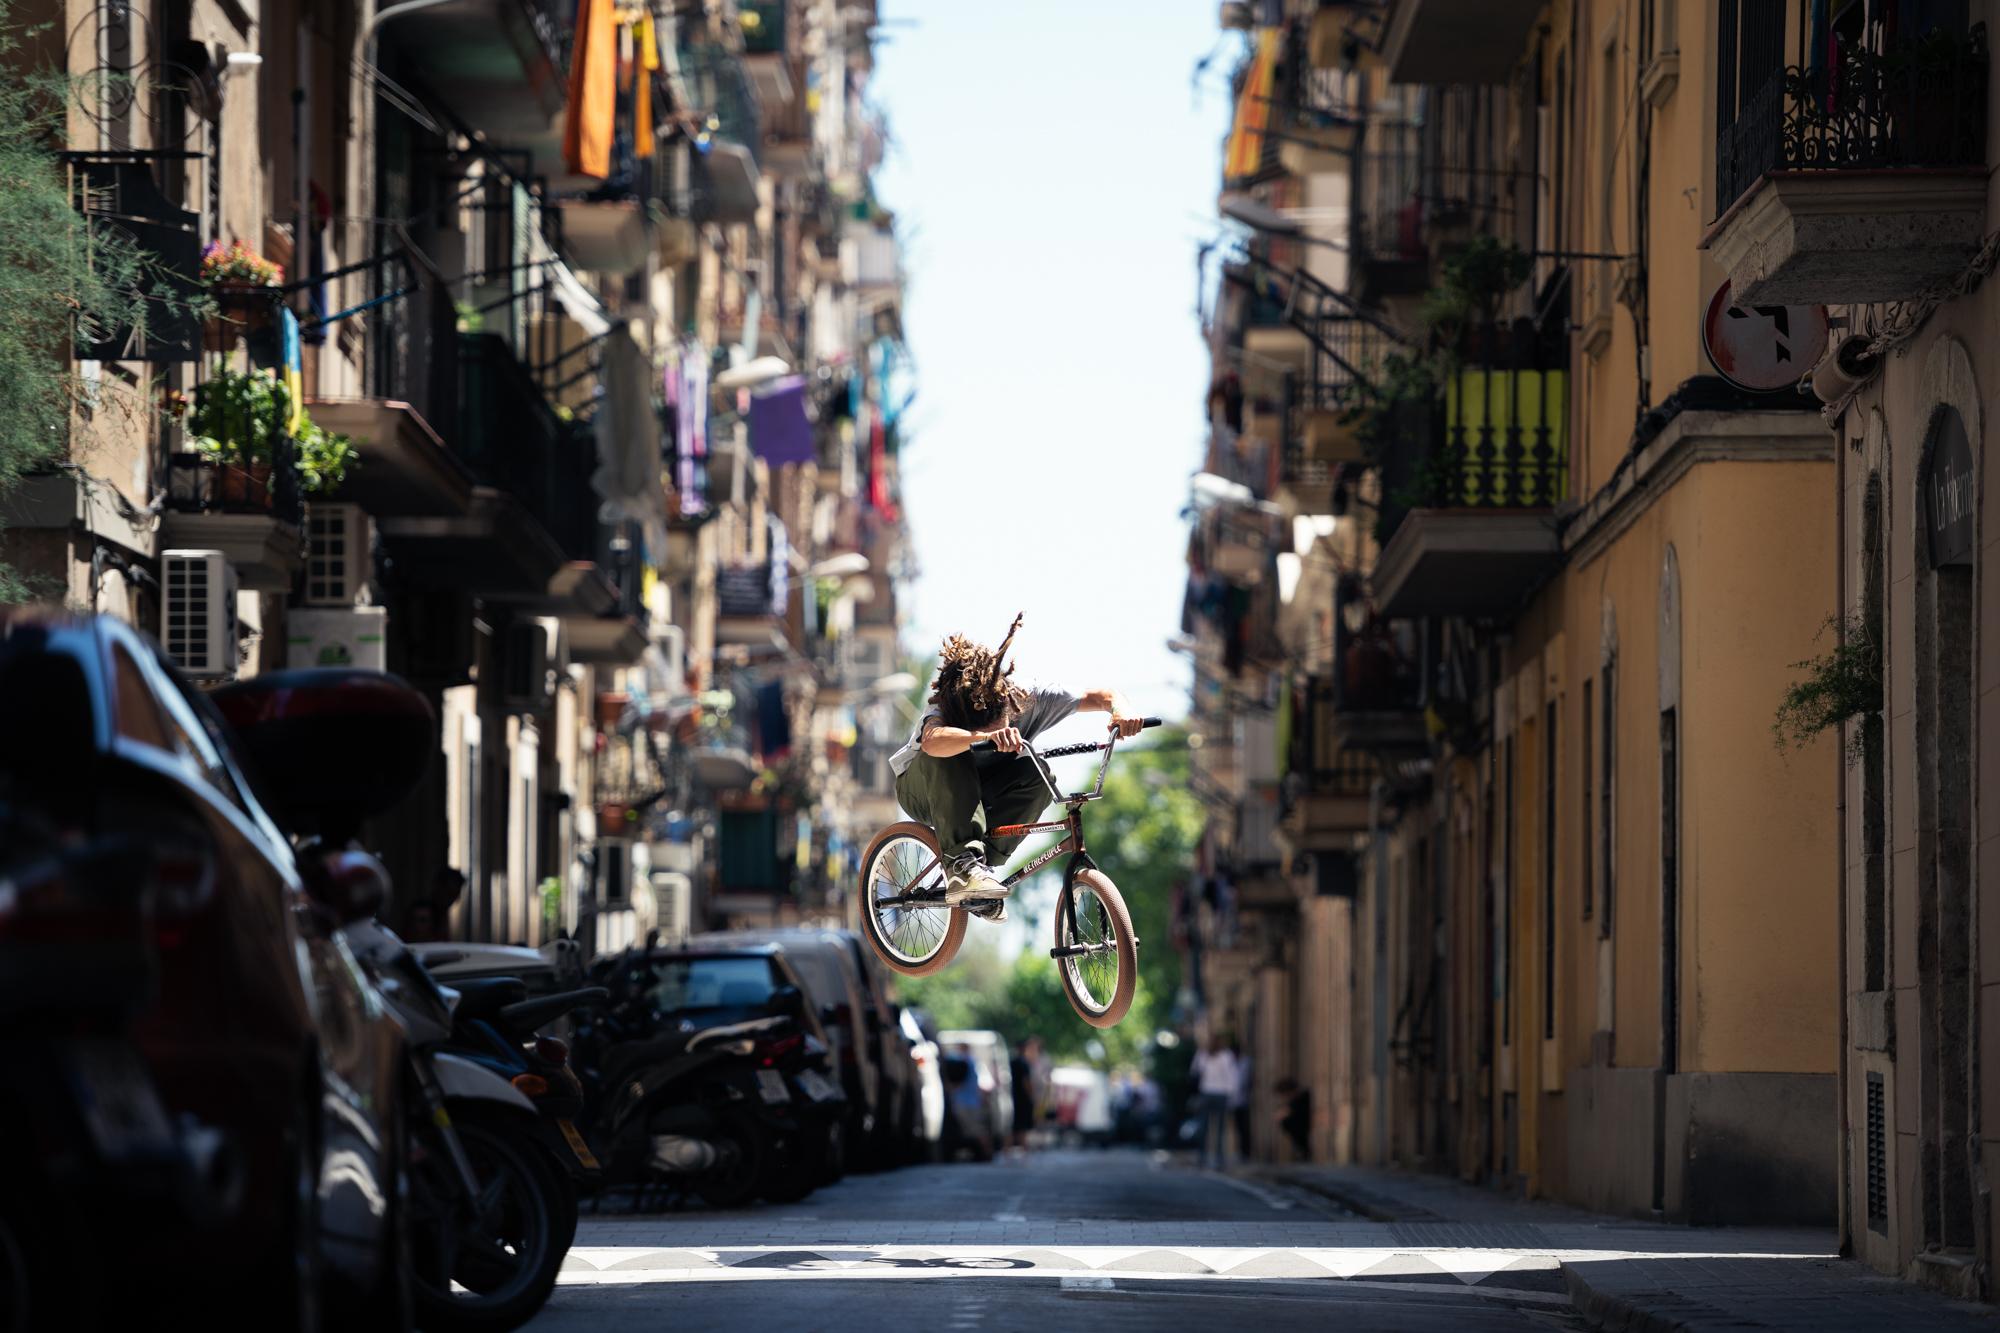 180716_BMX_Alessandro_Barcelona_8502052-Bearbeitet.jpg